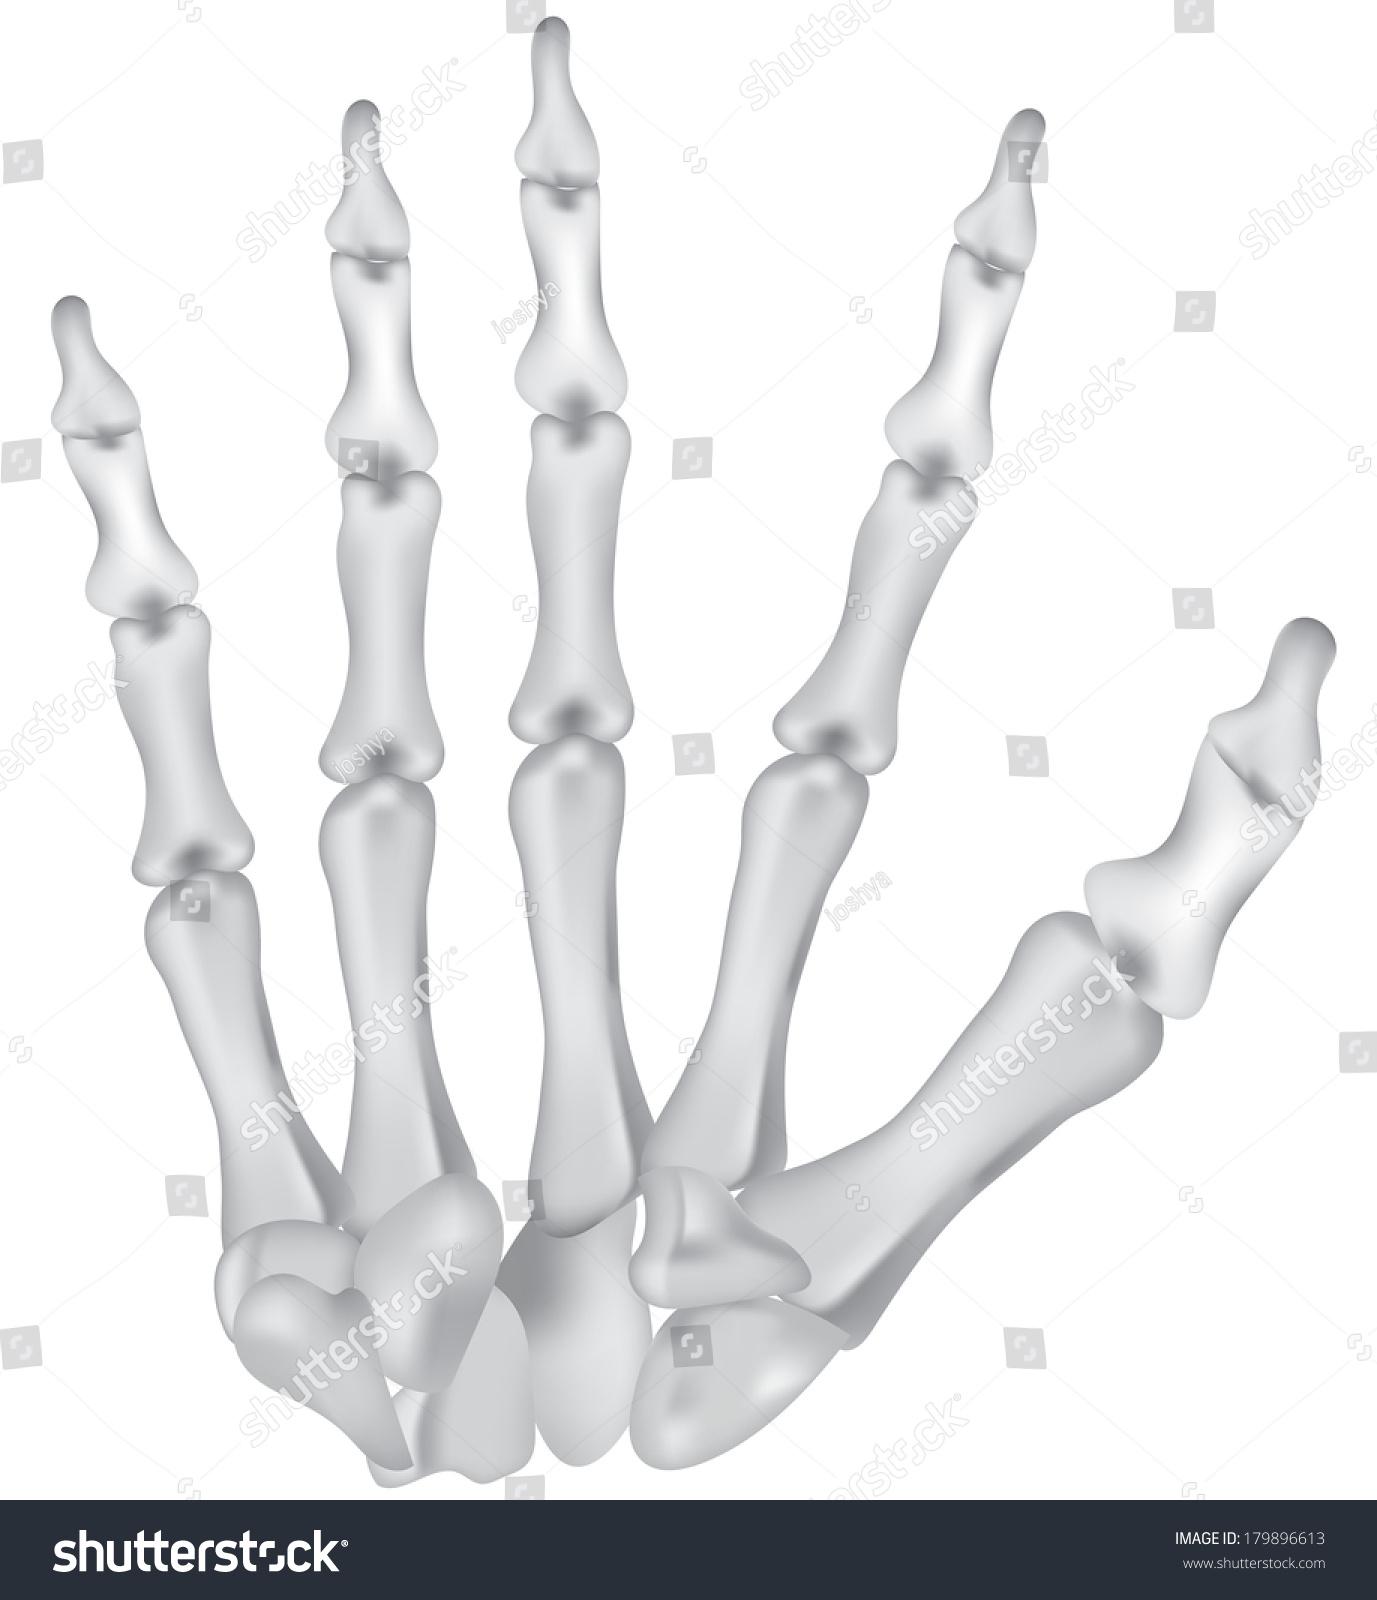 Royalty Free Stock Illustration Of Hand Bones Diagram Carpals Stock